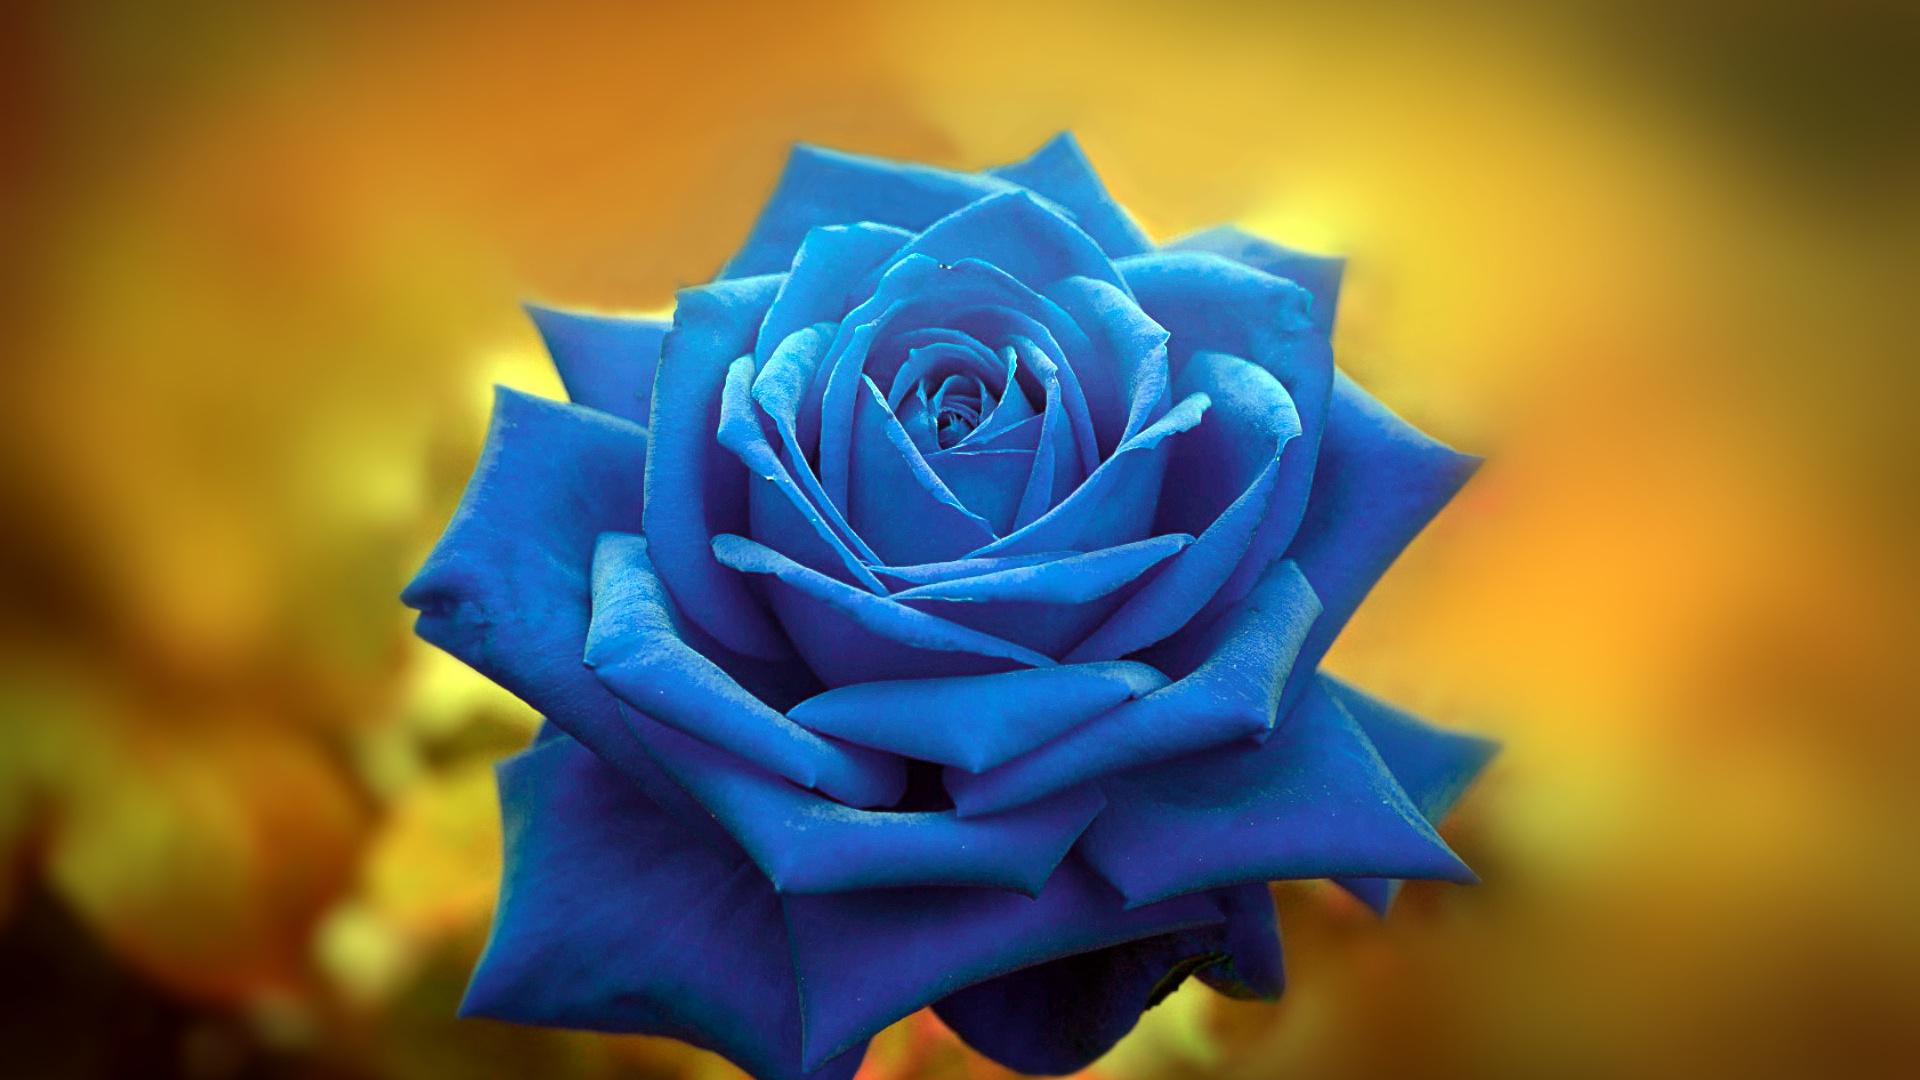 фон, роза, цвет, обои пидораса, photoshop master, петушиный фотошоп